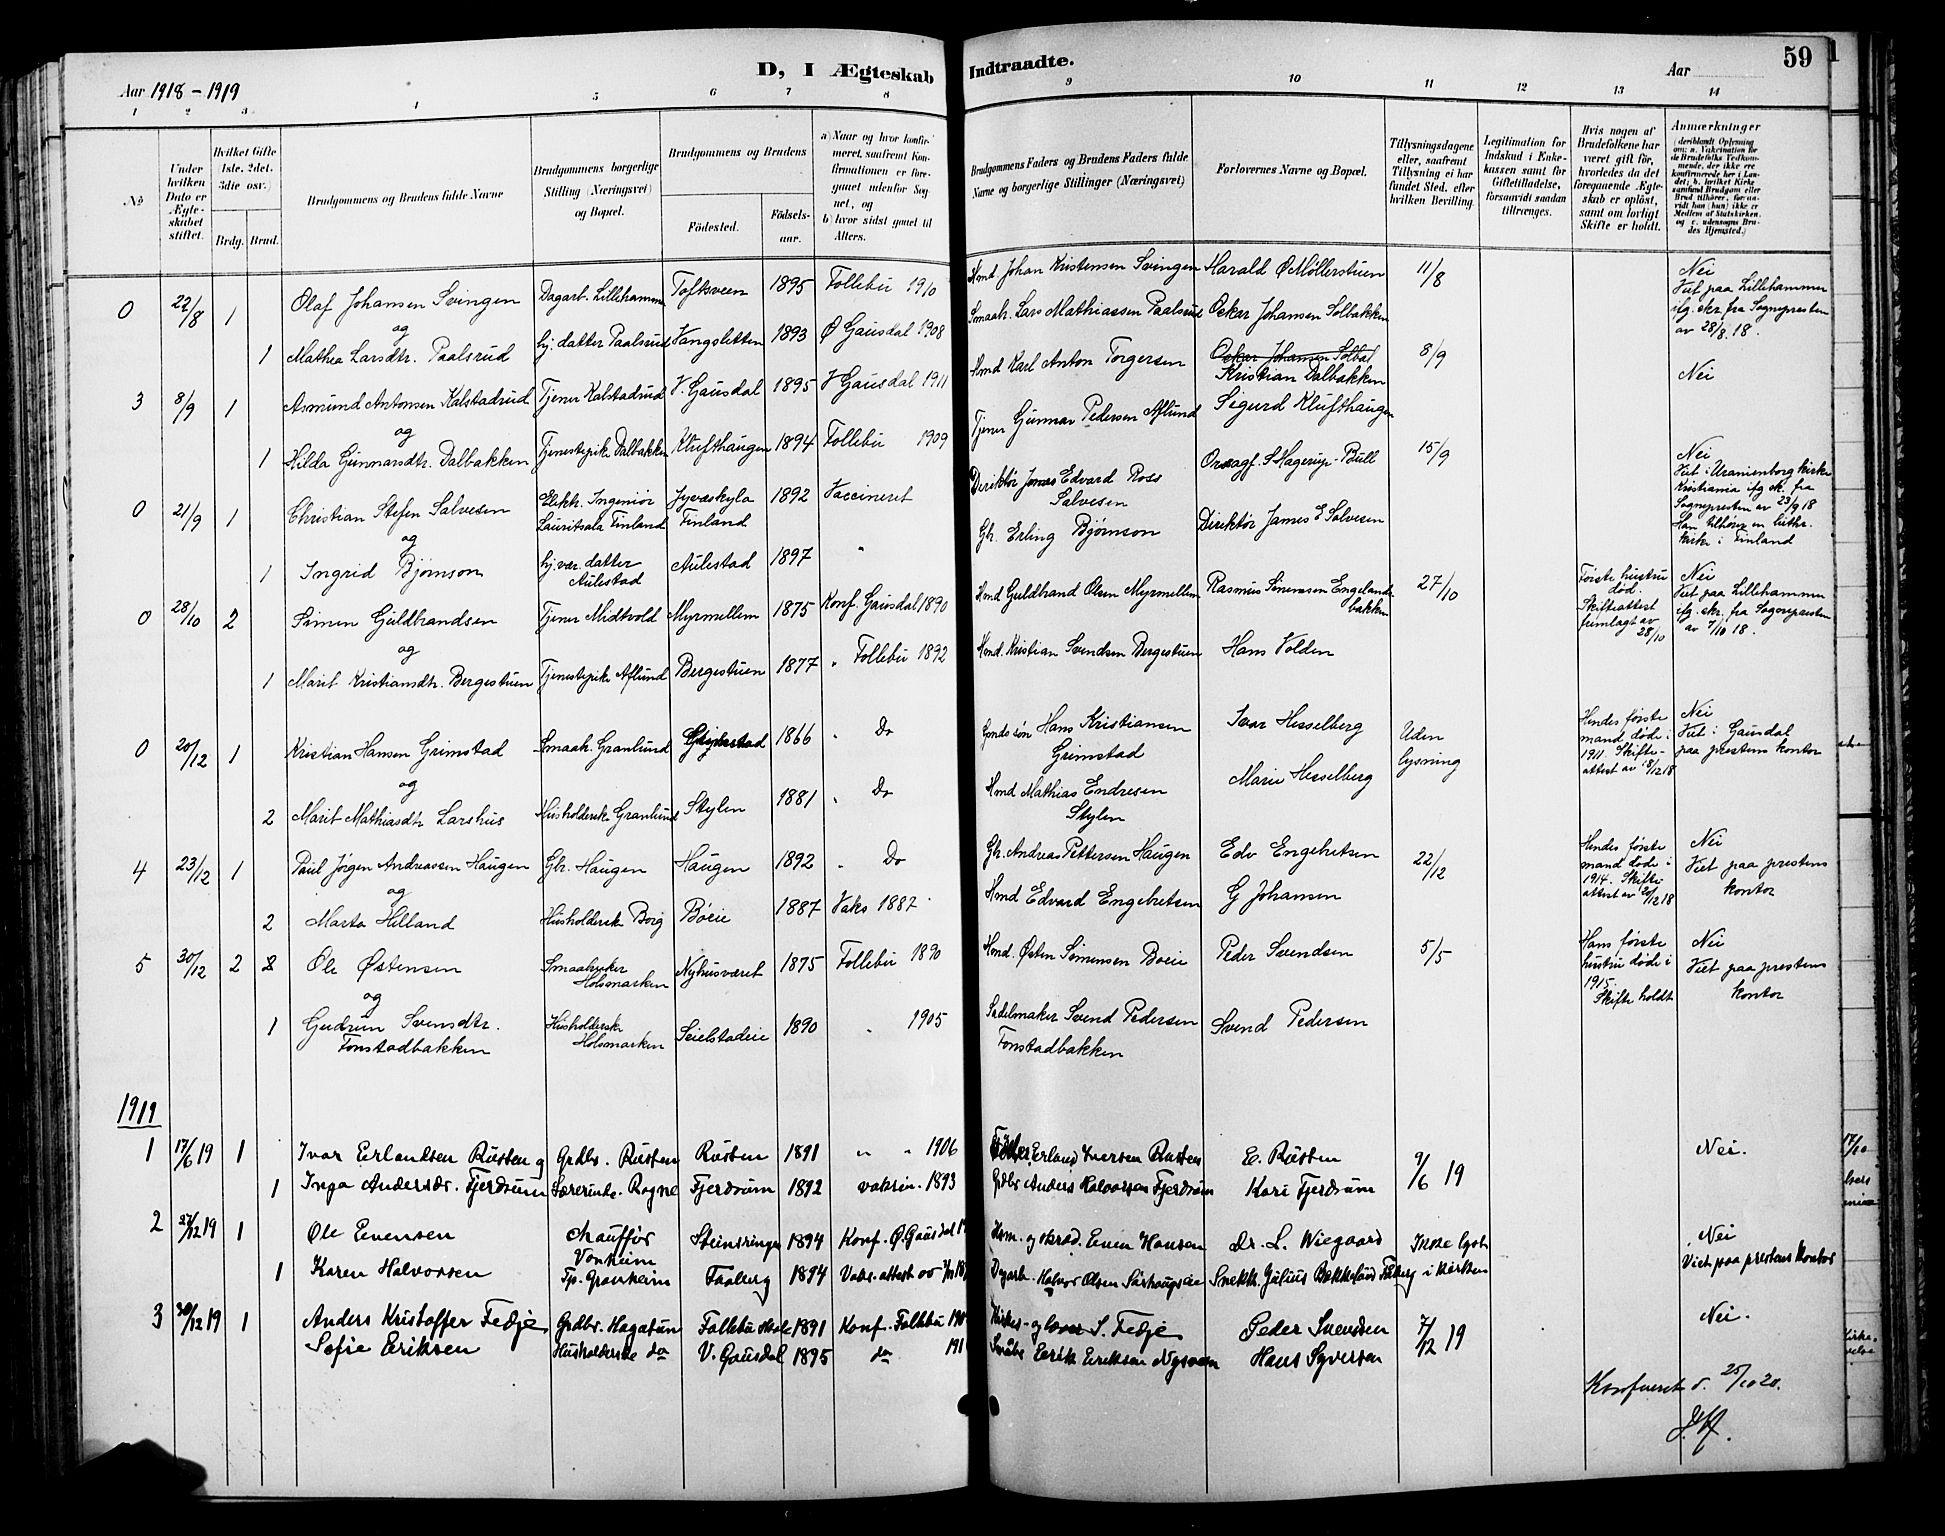 SAH, Østre Gausdal prestekontor, Klokkerbok nr. 3, 1894-1915, s. 59